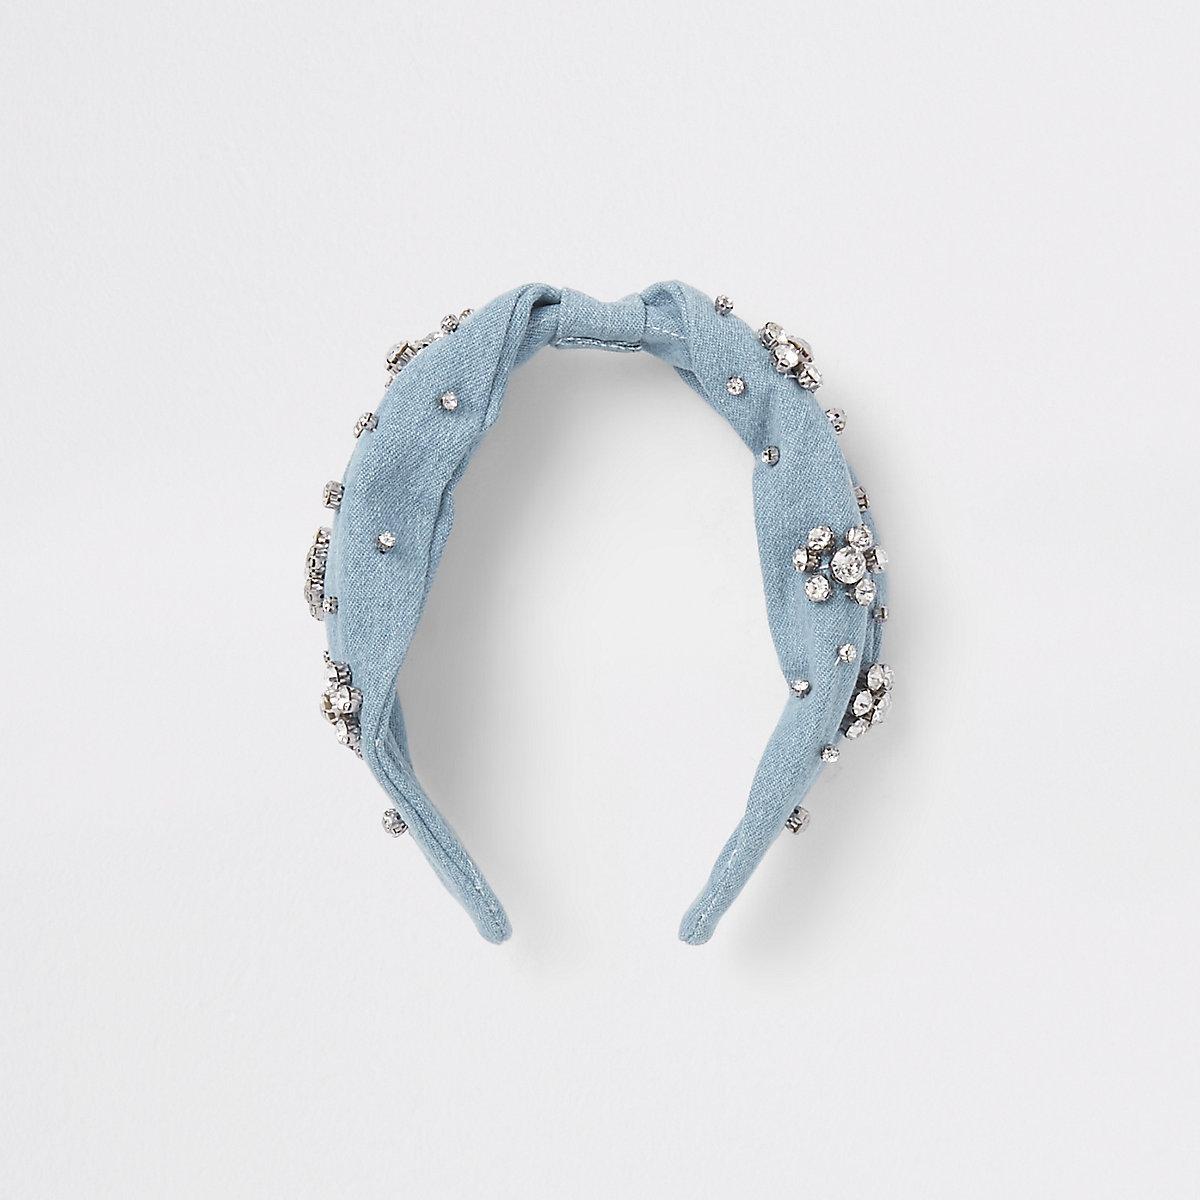 Blue denim rhinestone embellished headband